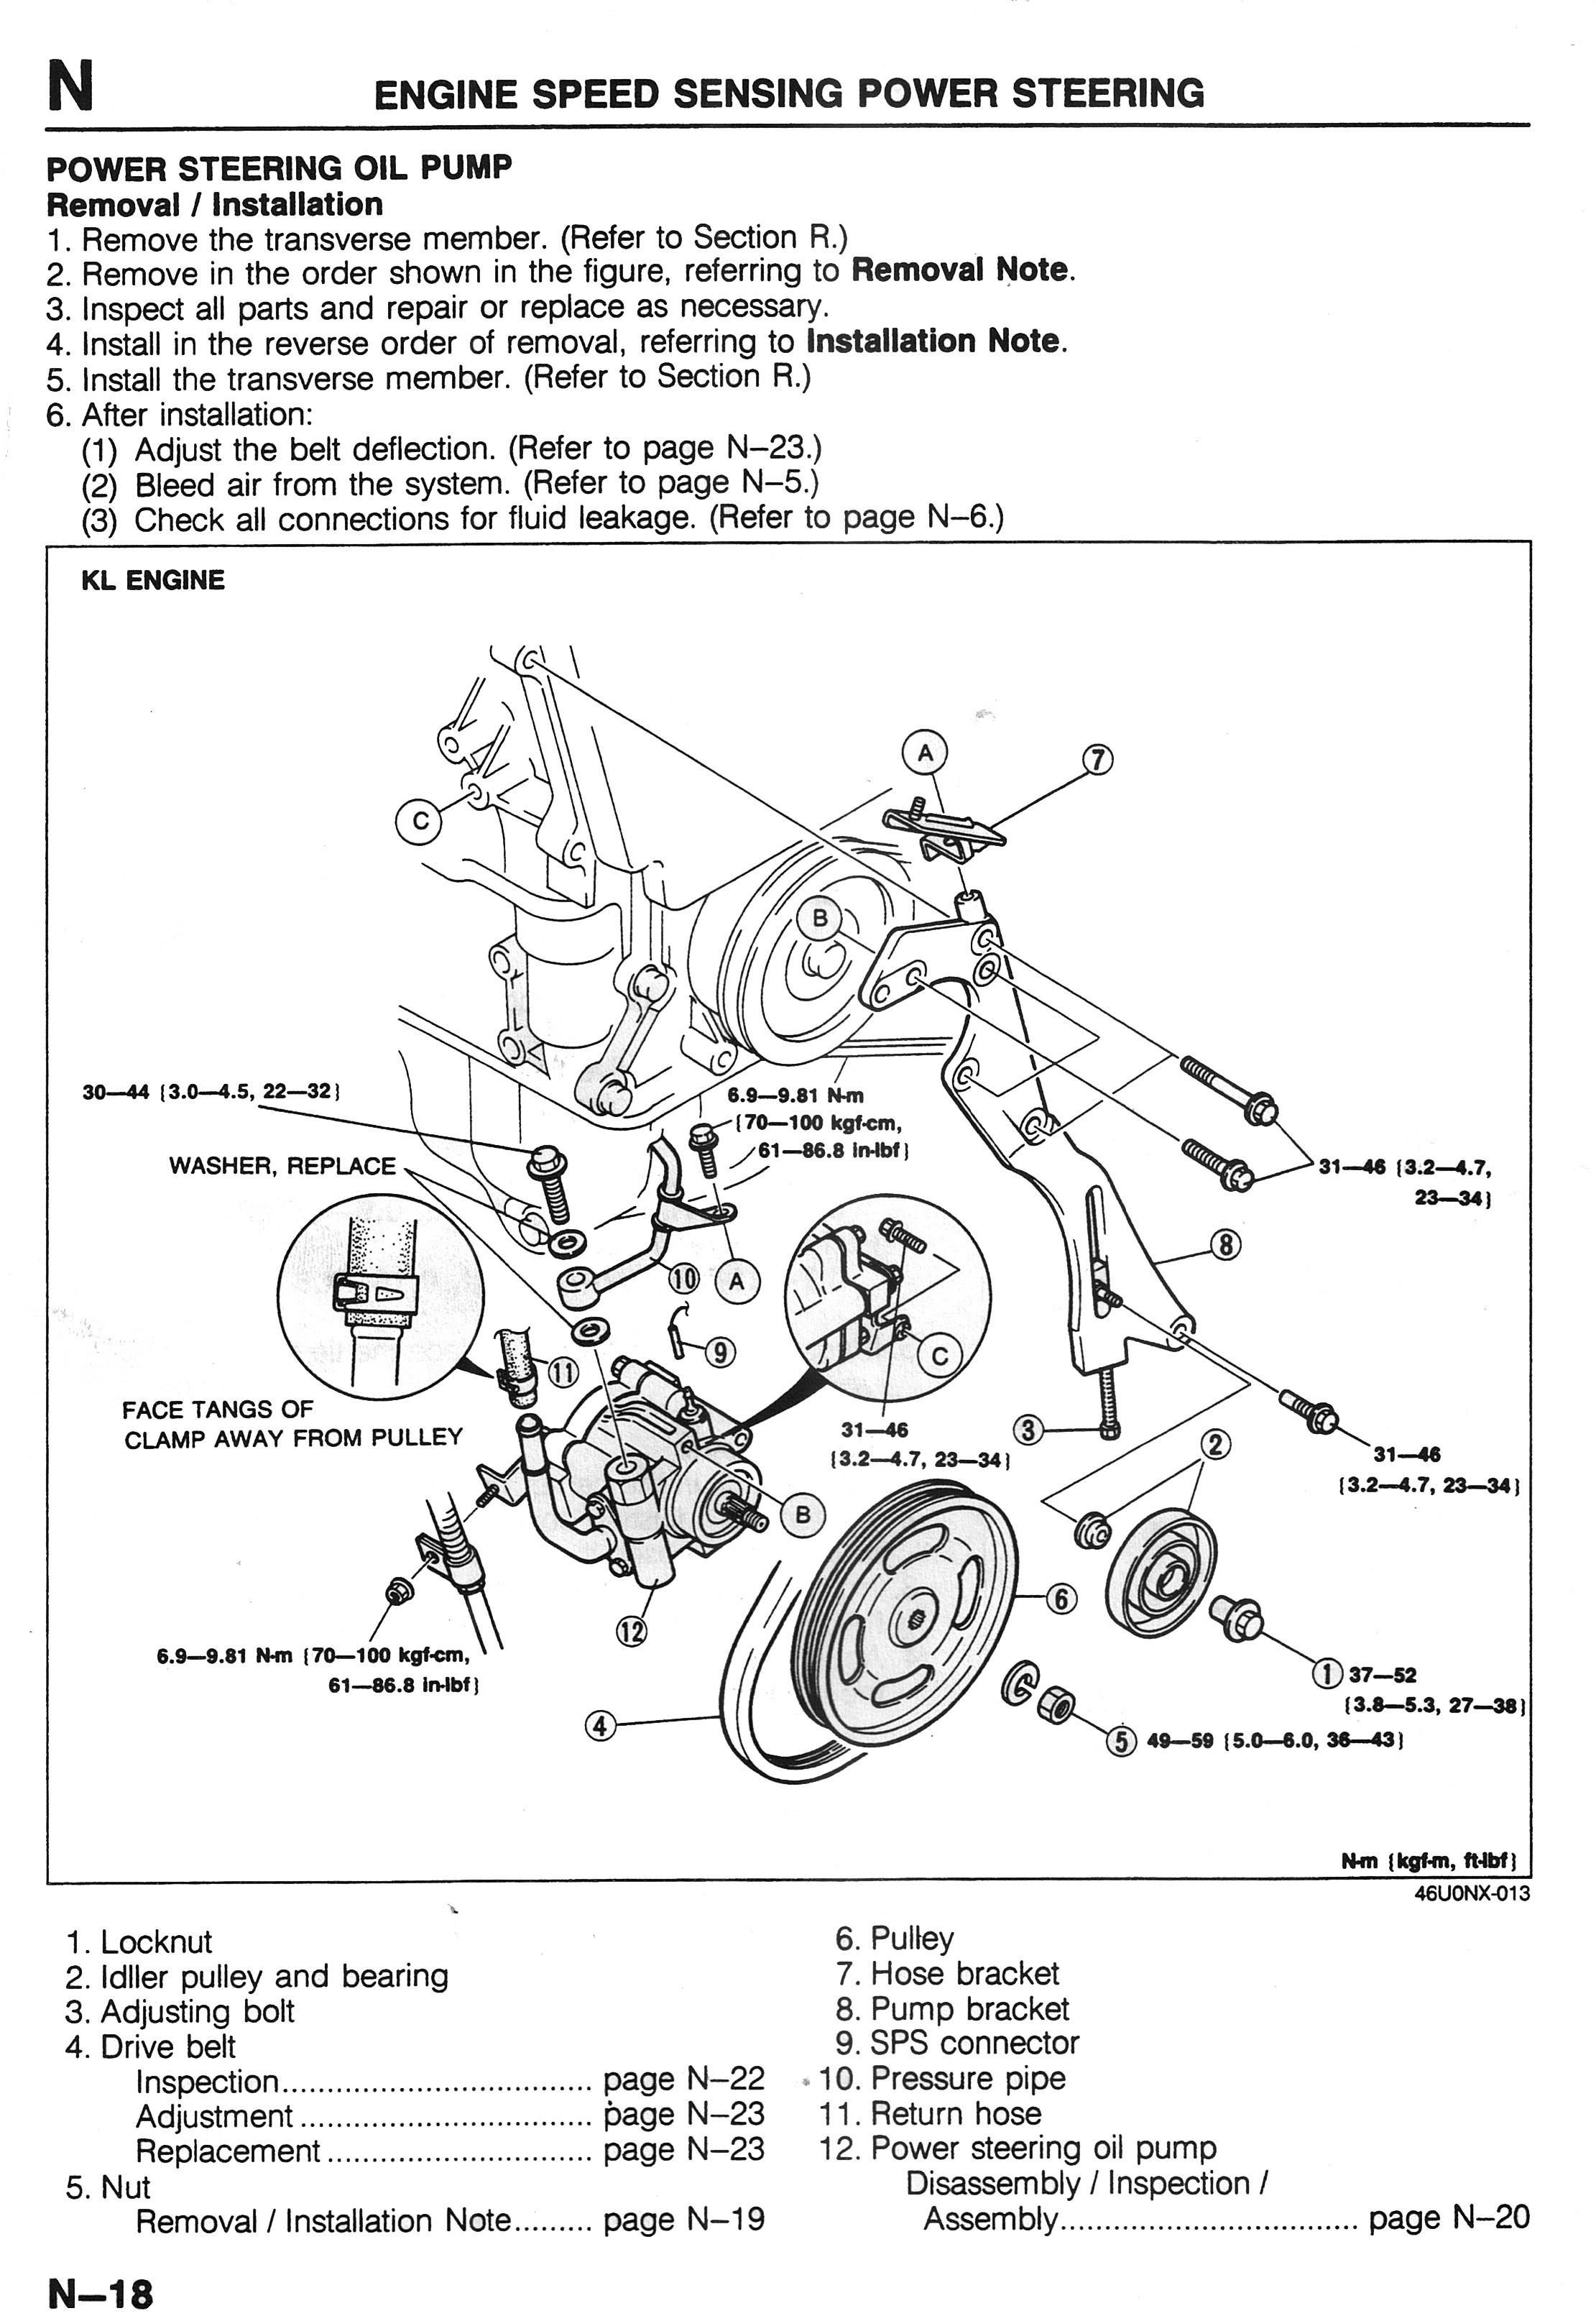 2001 mazda millenia engine diagram 2002 mazda millenia